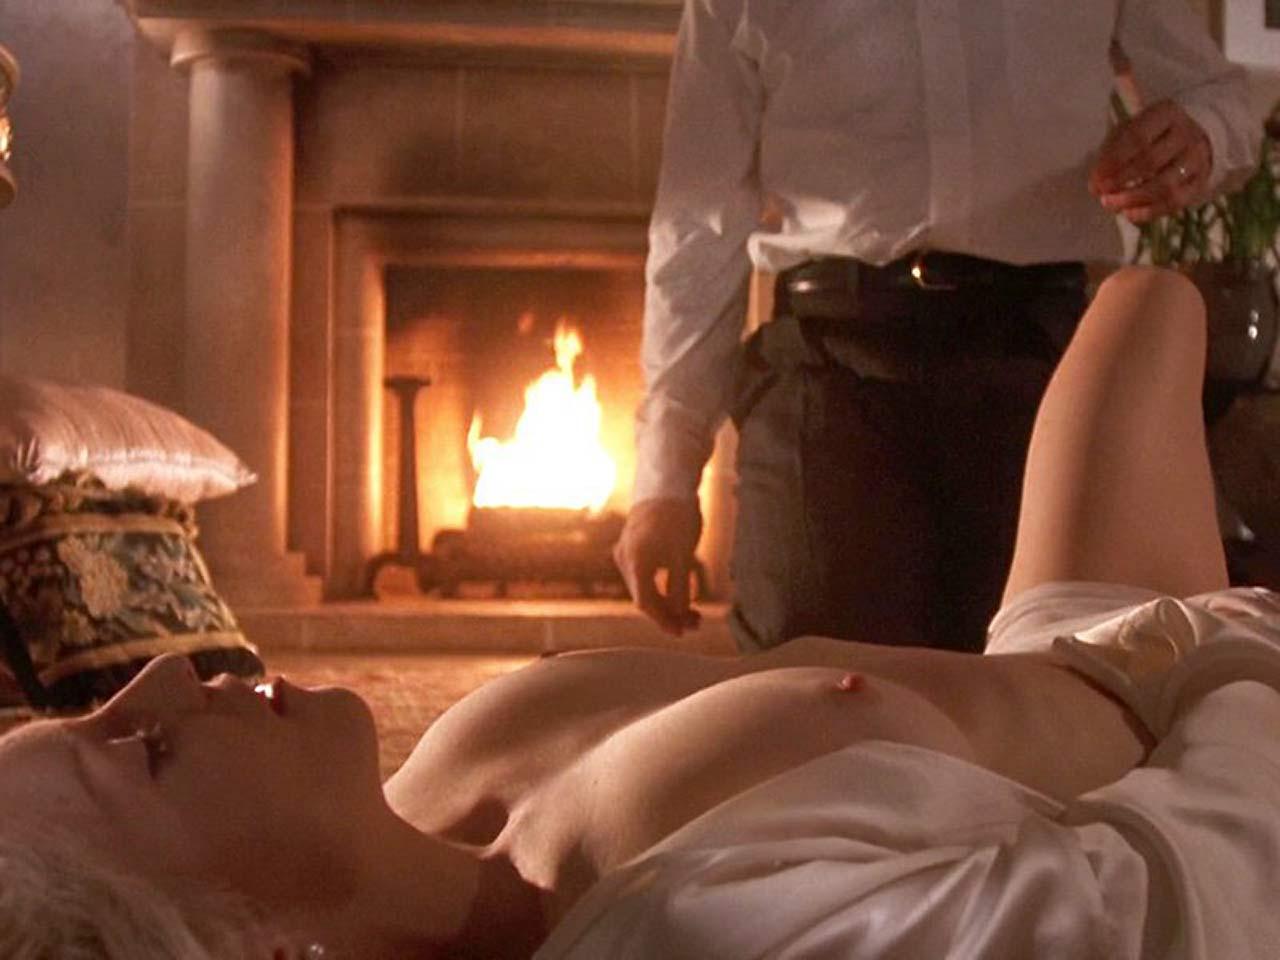 Scenes sex Madonna nude